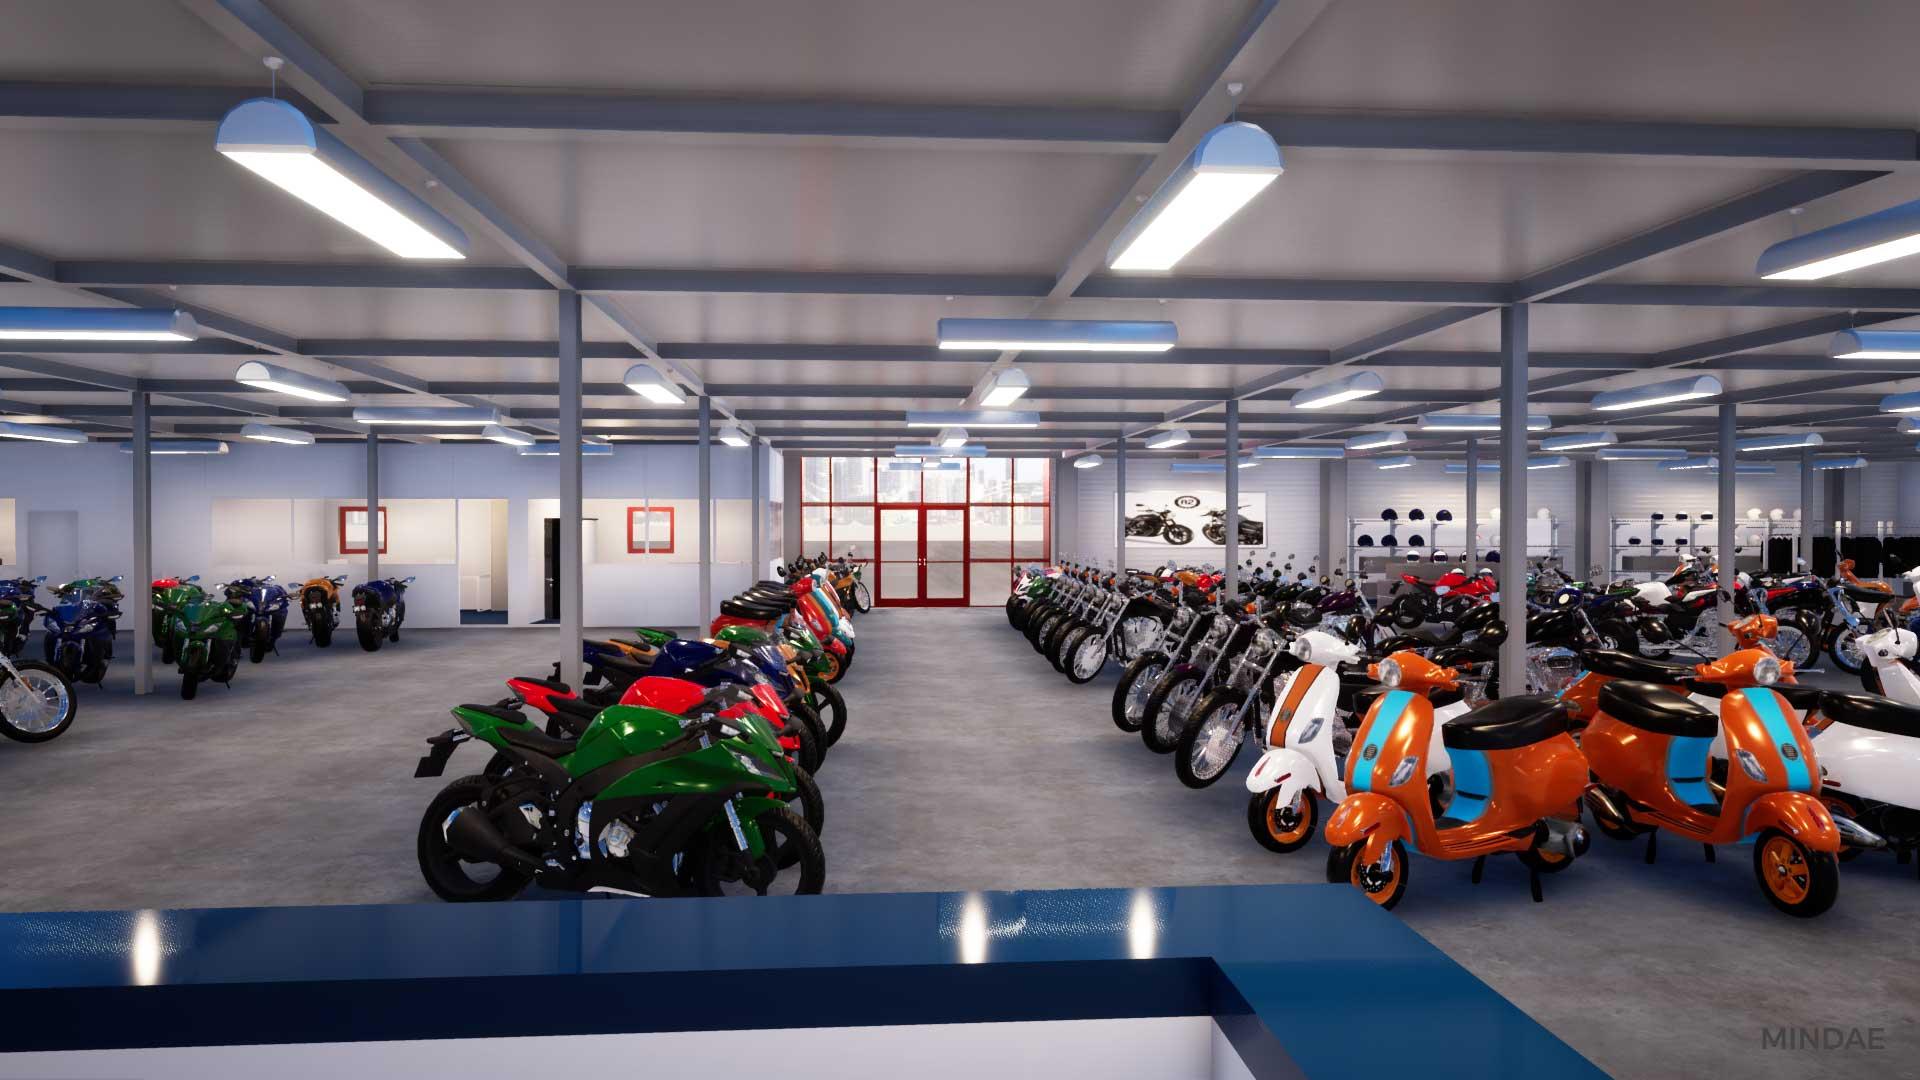 Mindae_3D_B-ingenierie_Industrie_moto_garage_Calvados-(14)